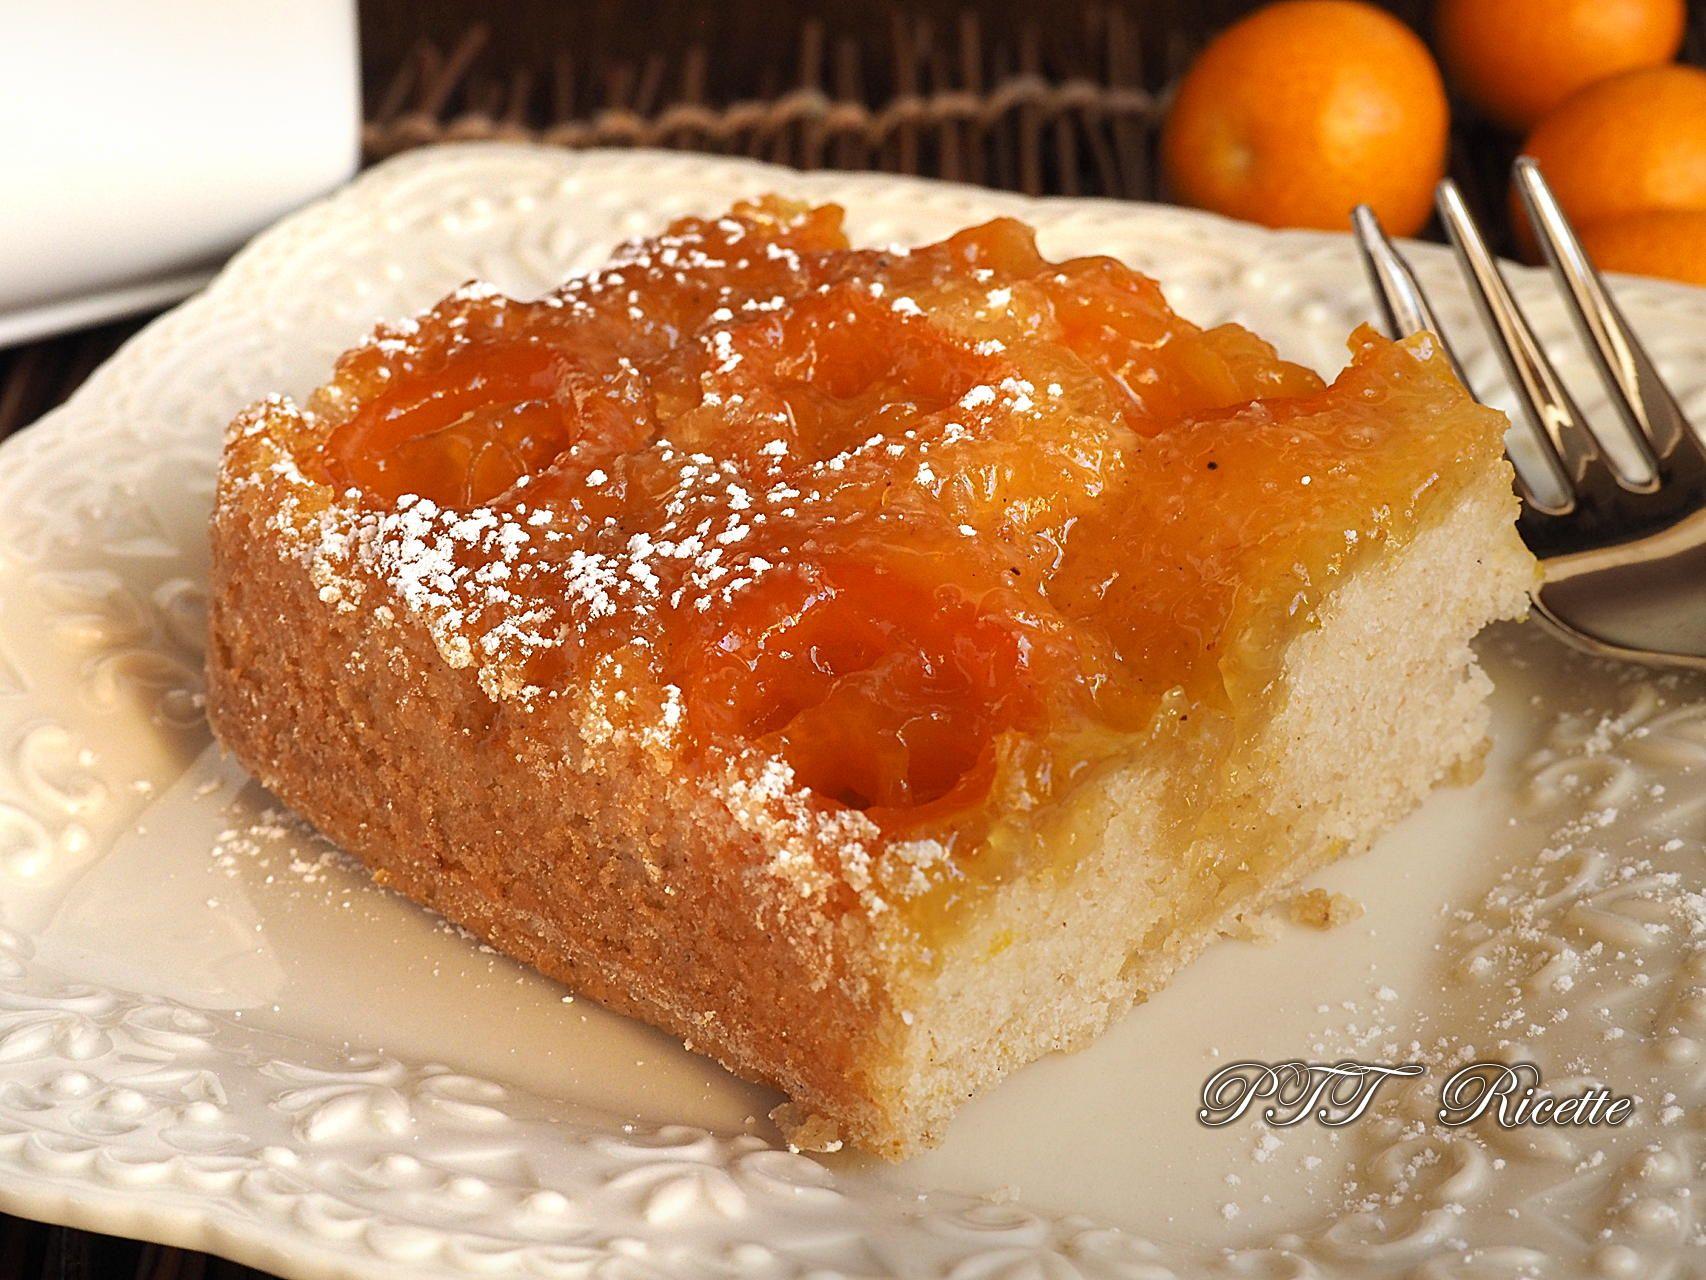 Decorazioni Torte Cinesi : Torta light con mandarini cinesi kumquat una torta dietetica